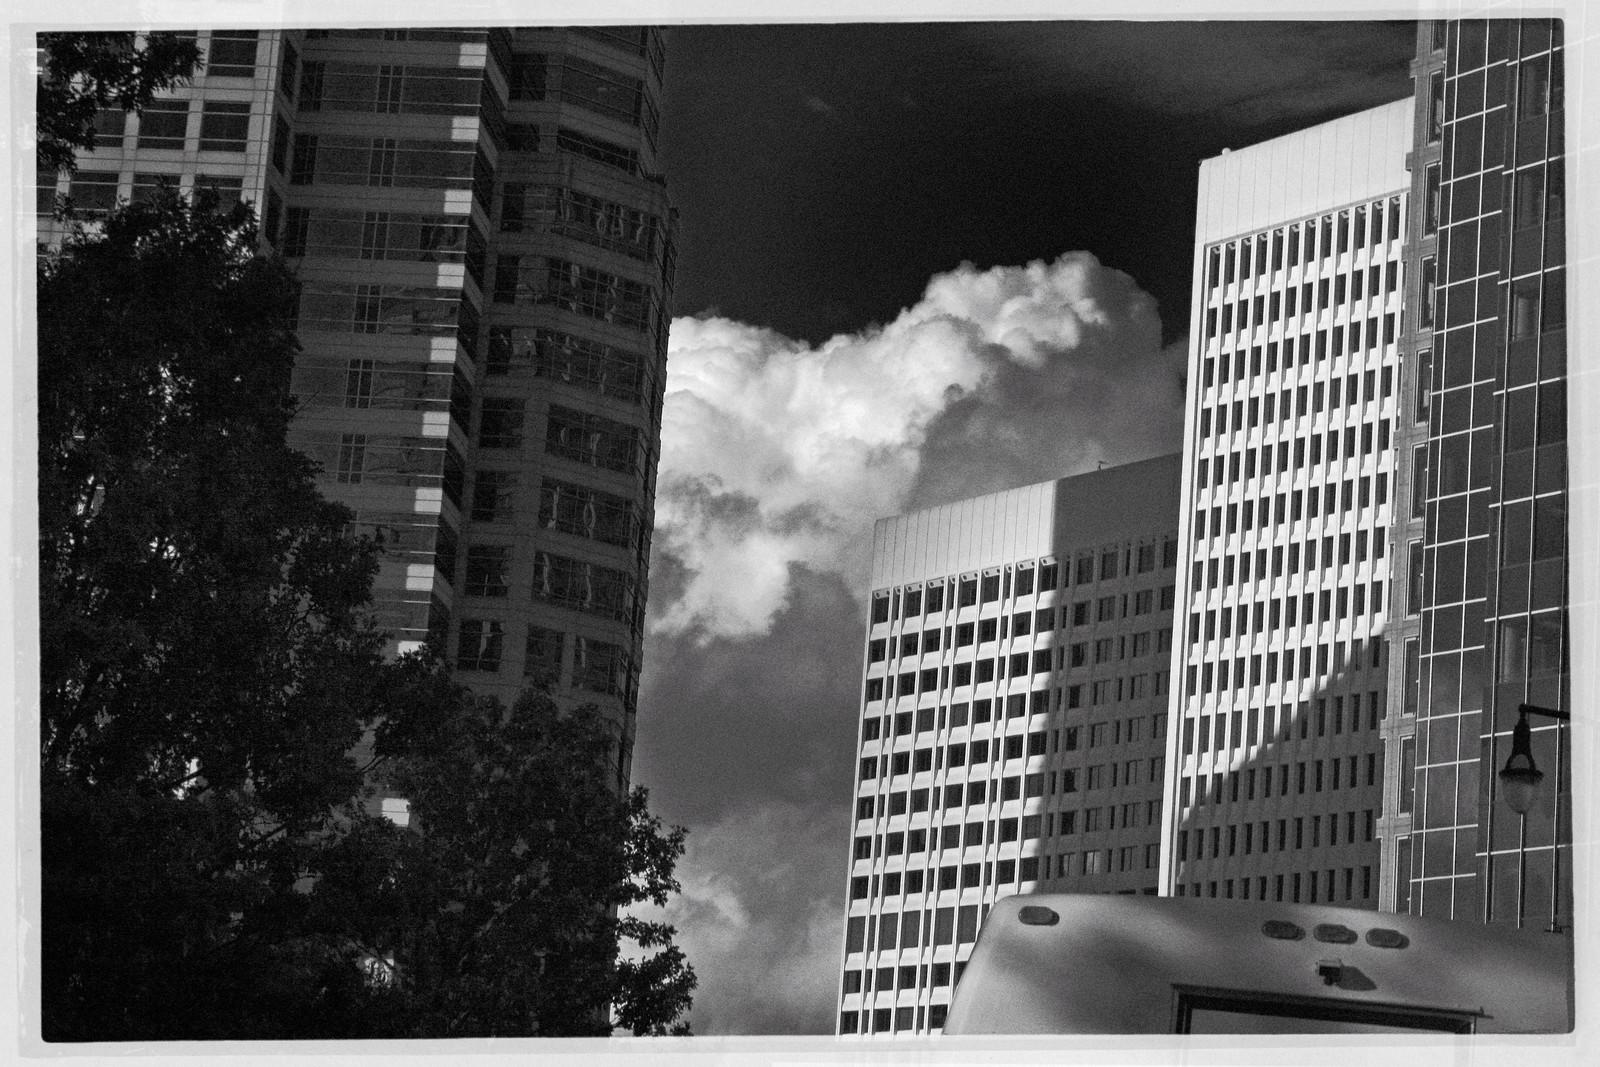 Midtown Atlanta, Bus and Clouds